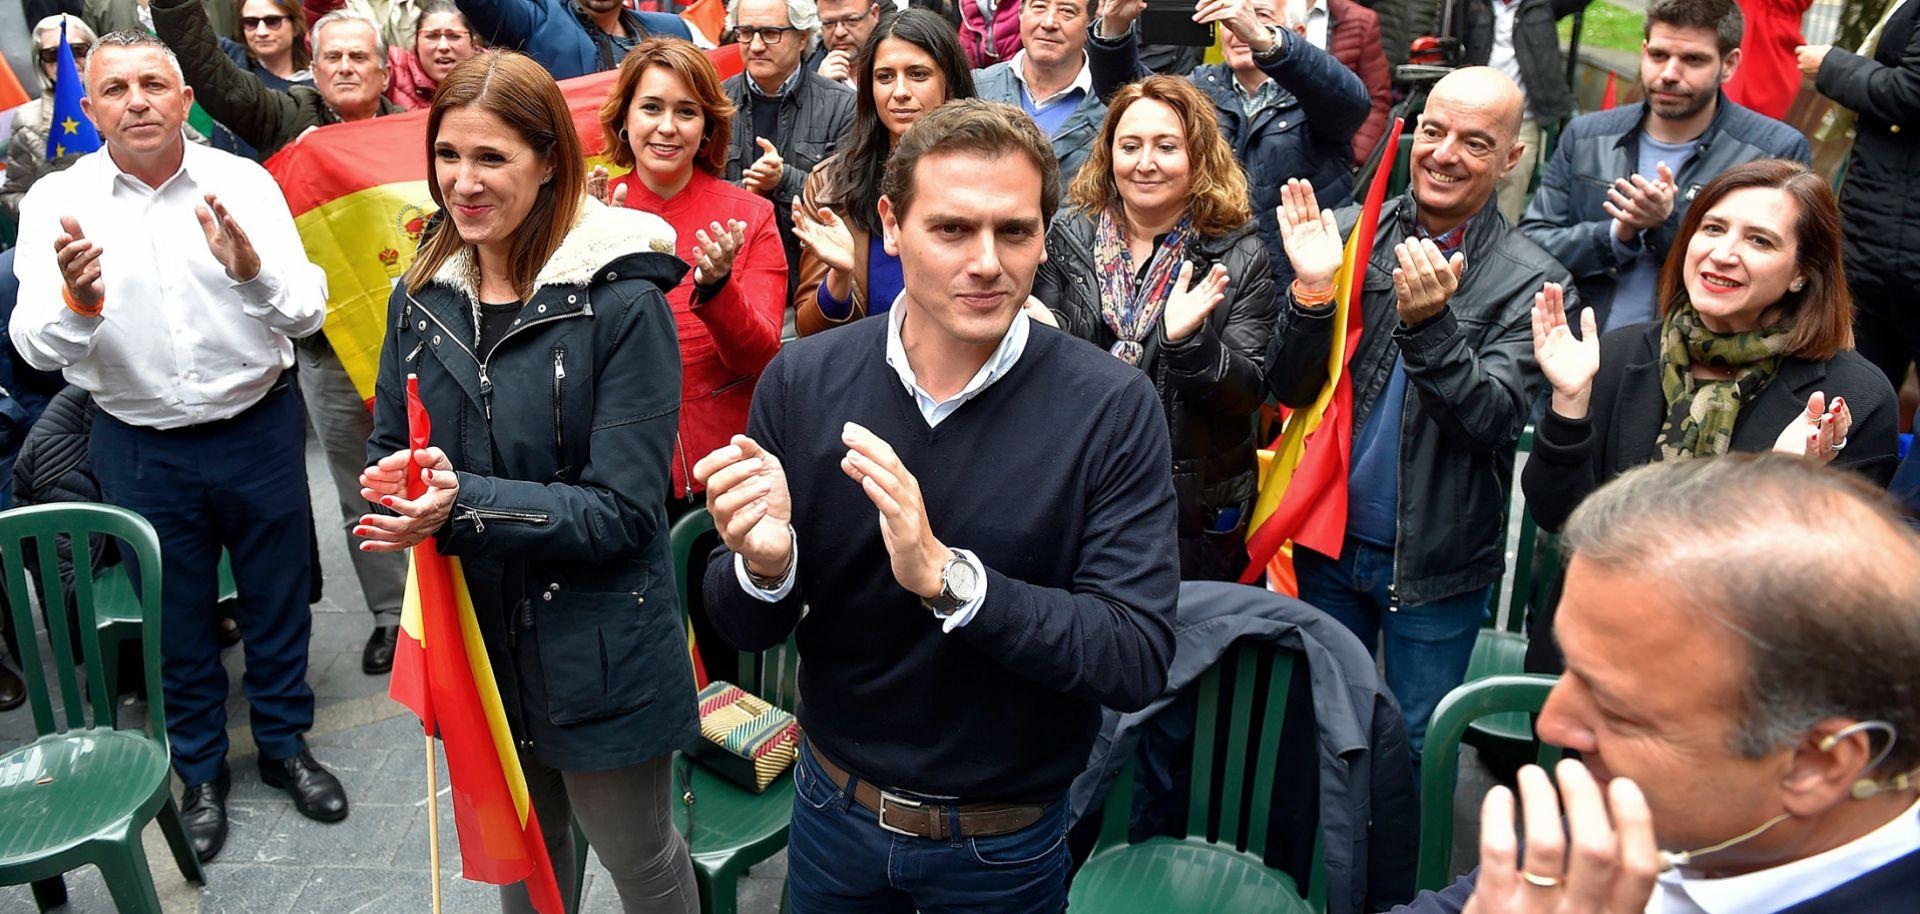 Albert Rivera, center, leader of Spain's center-right Ciudadanos (Citizens) party, leads a campaign rally in Renteria on April 14, 2019.